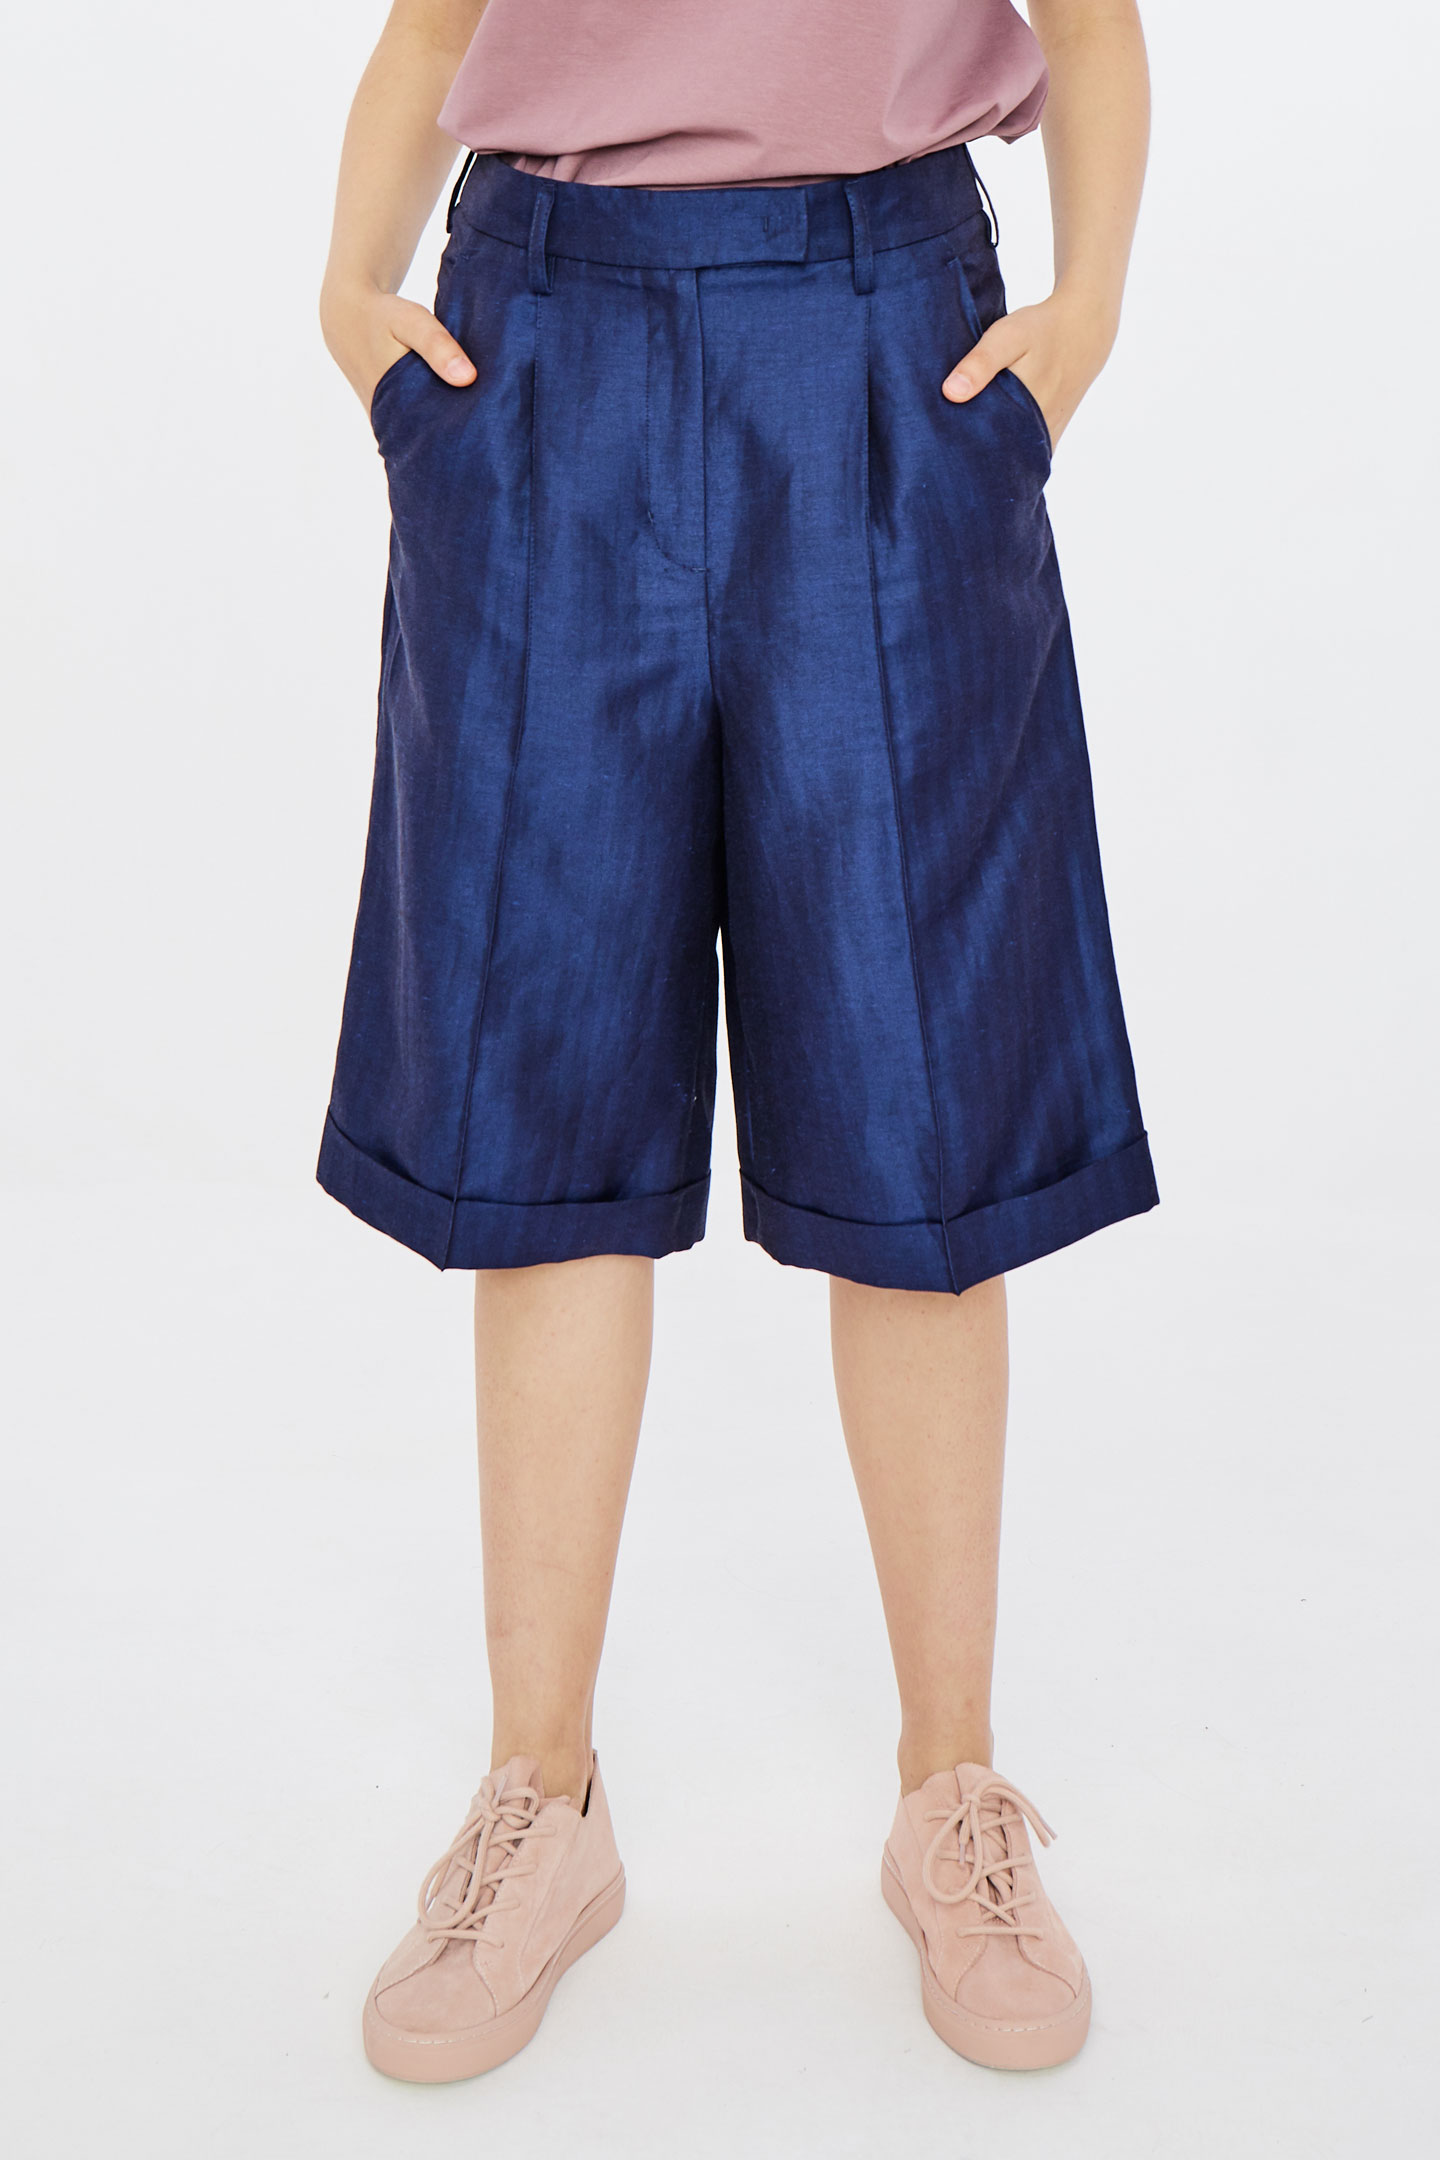 458ffbdfb360 шорты Belka за 4014 рублей в интернет магазине Click-Boutique